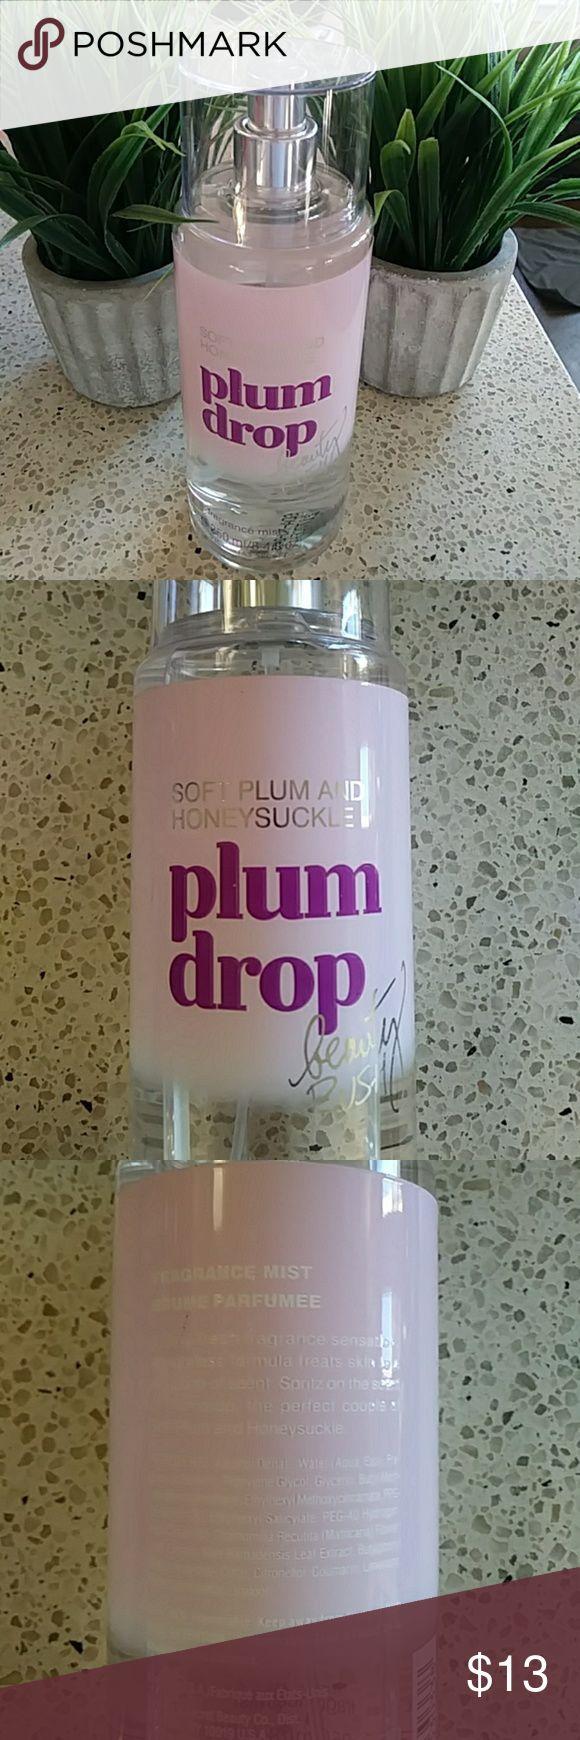 I just added this listing on Poshmark: Victoria Secret Body Spray plum drop beauty rush. #shopmycloset #poshmark #fashion #shopping #style #forsale #victoria secret #Other